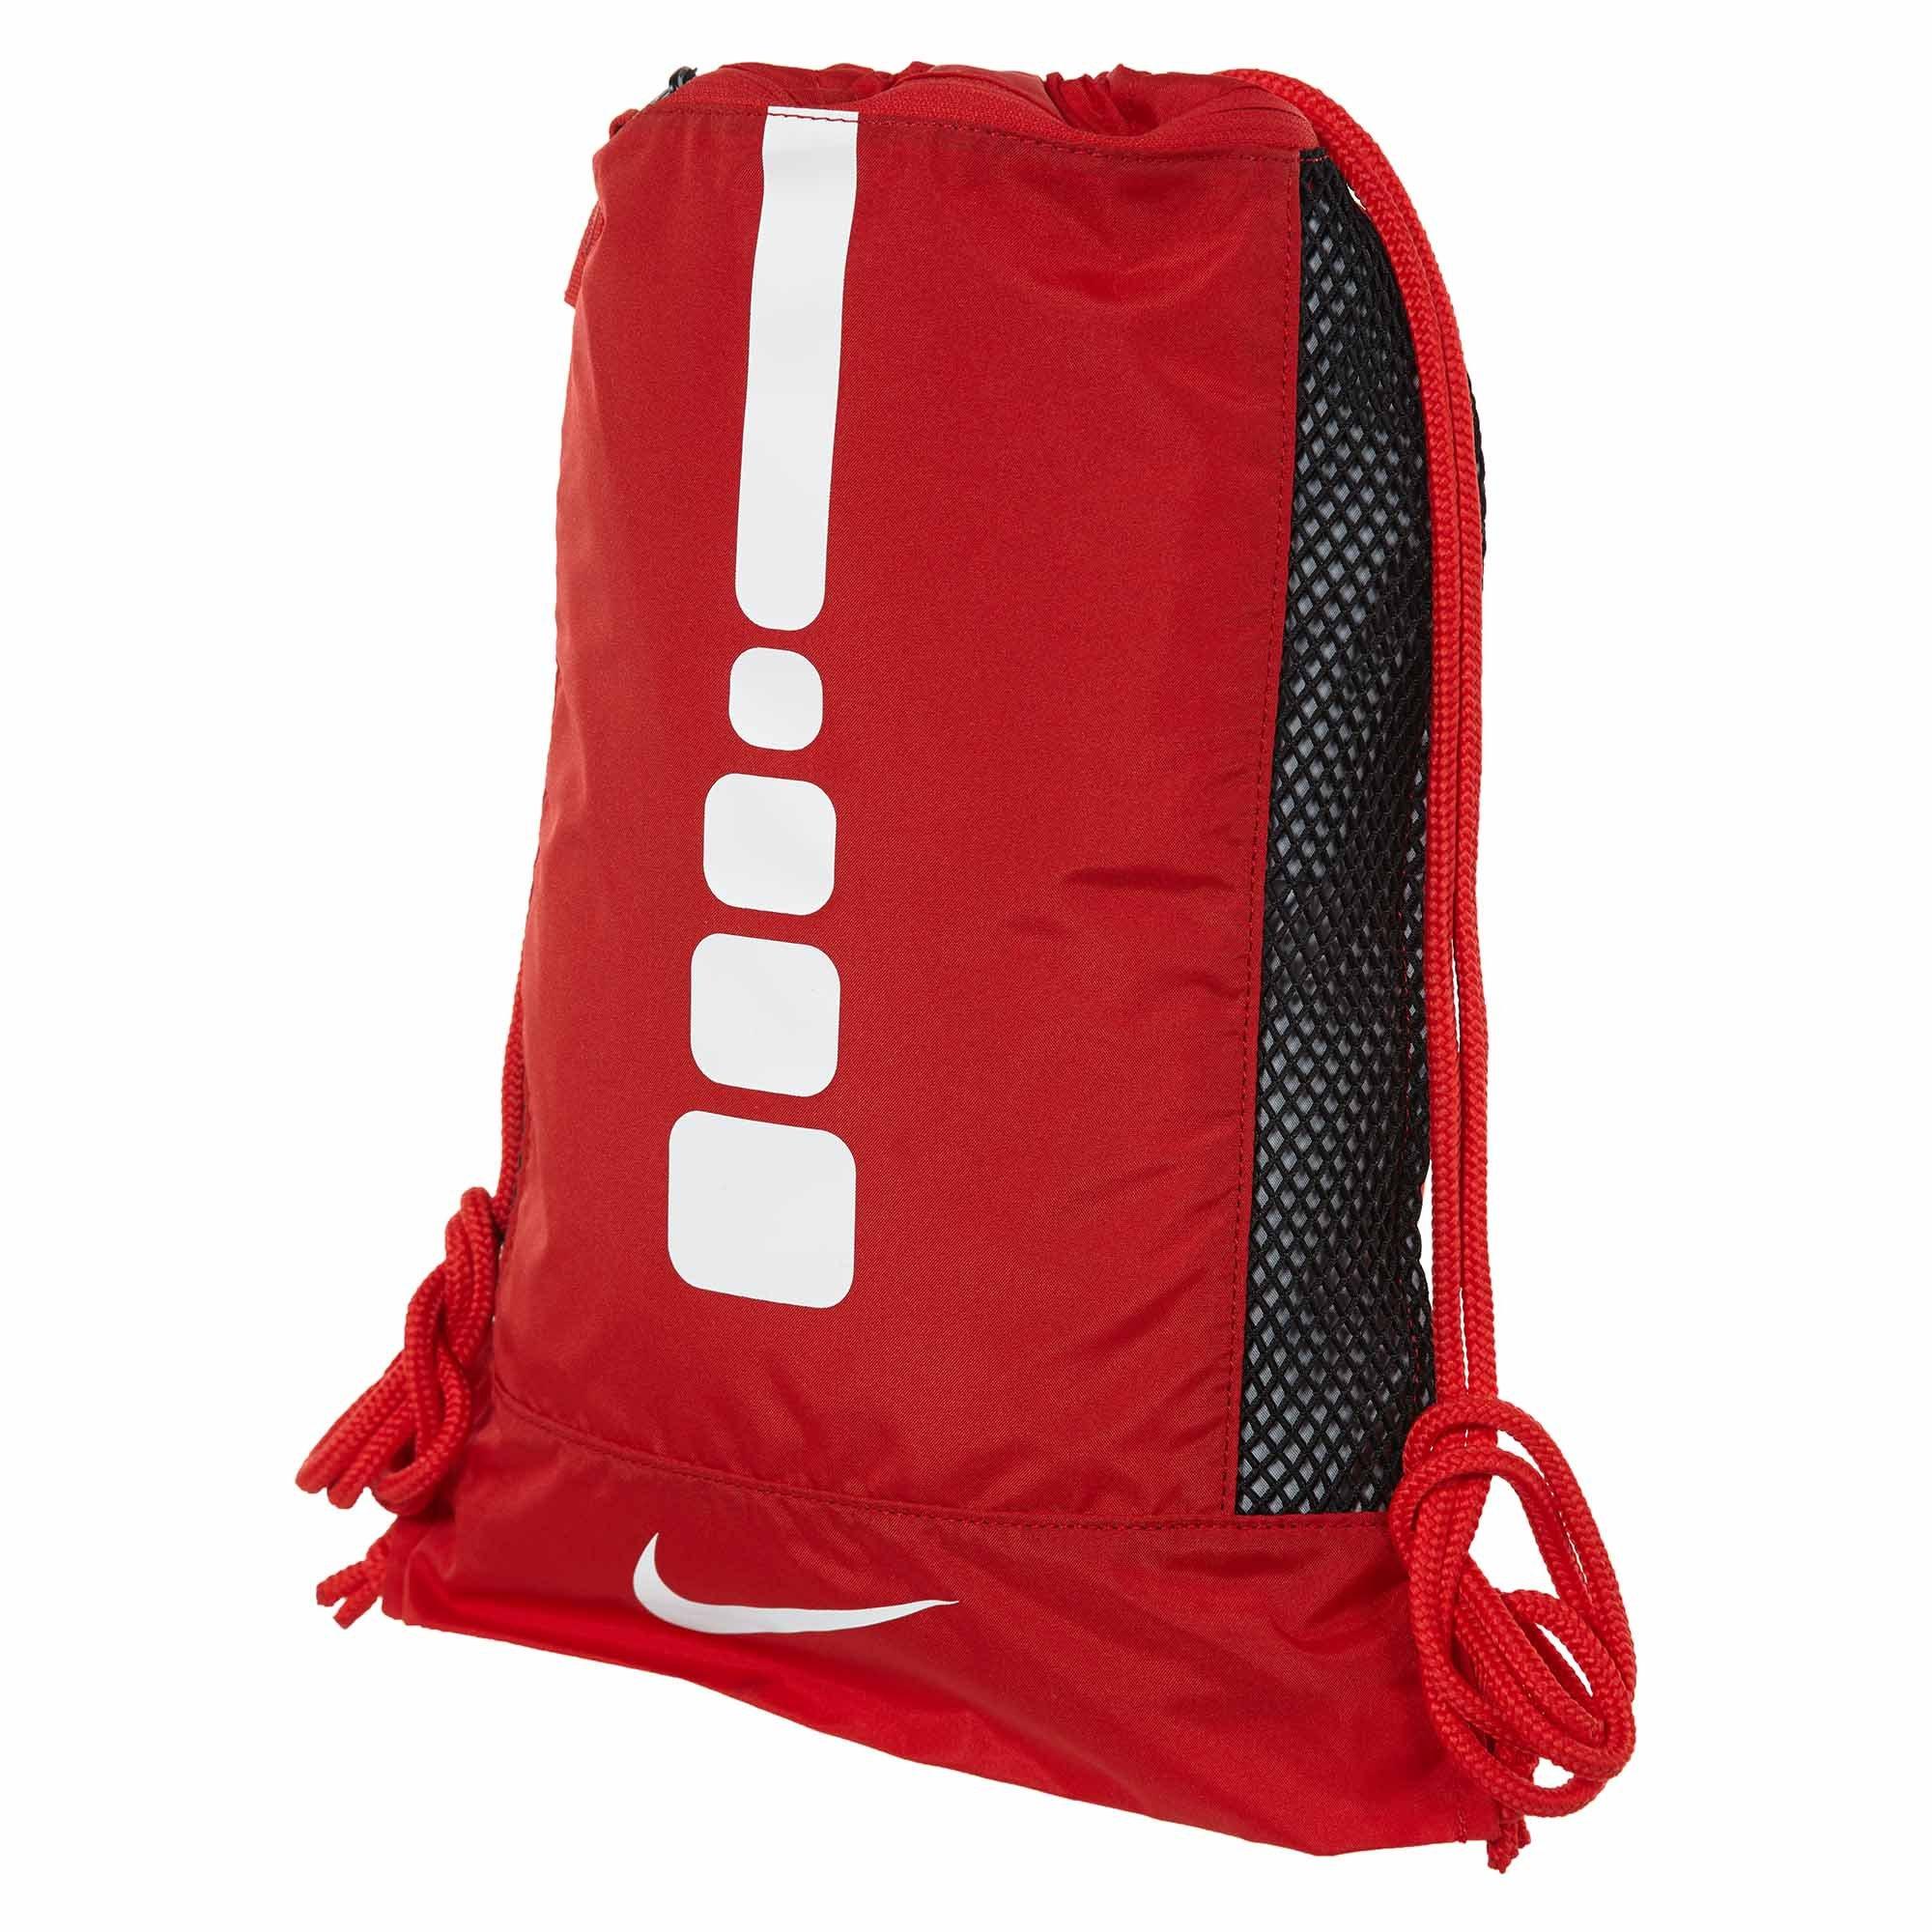 029faf9fb98b Galleon - Nike Men s Hoops Elite Basketball Gym Sack (University  RED University RED White)